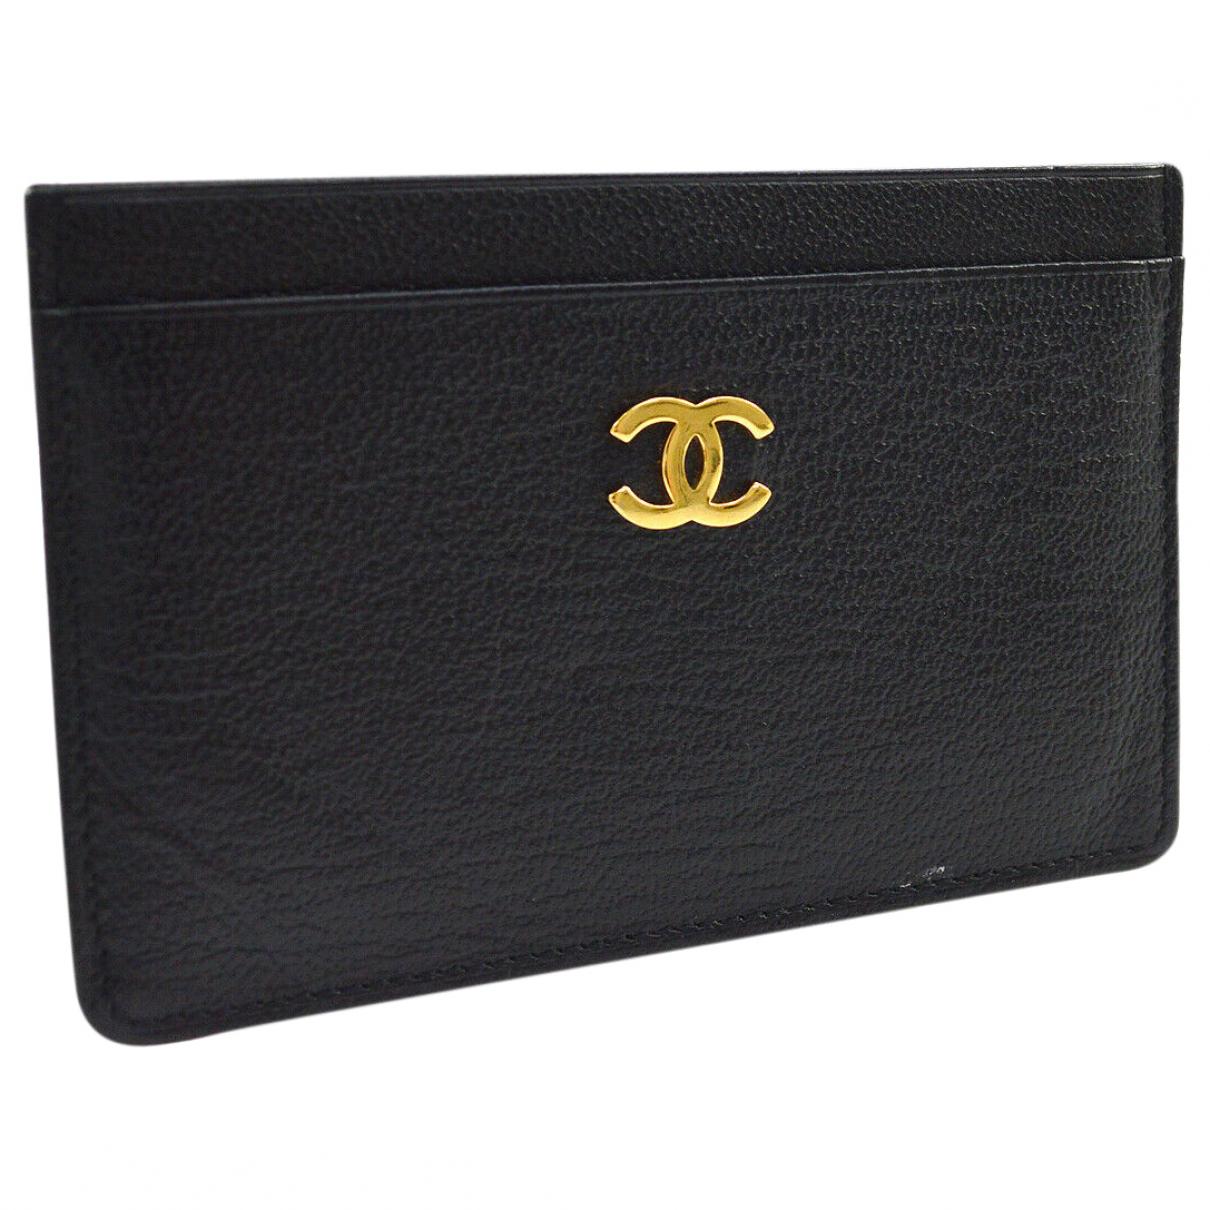 Tarjetero de Cuero Chanel